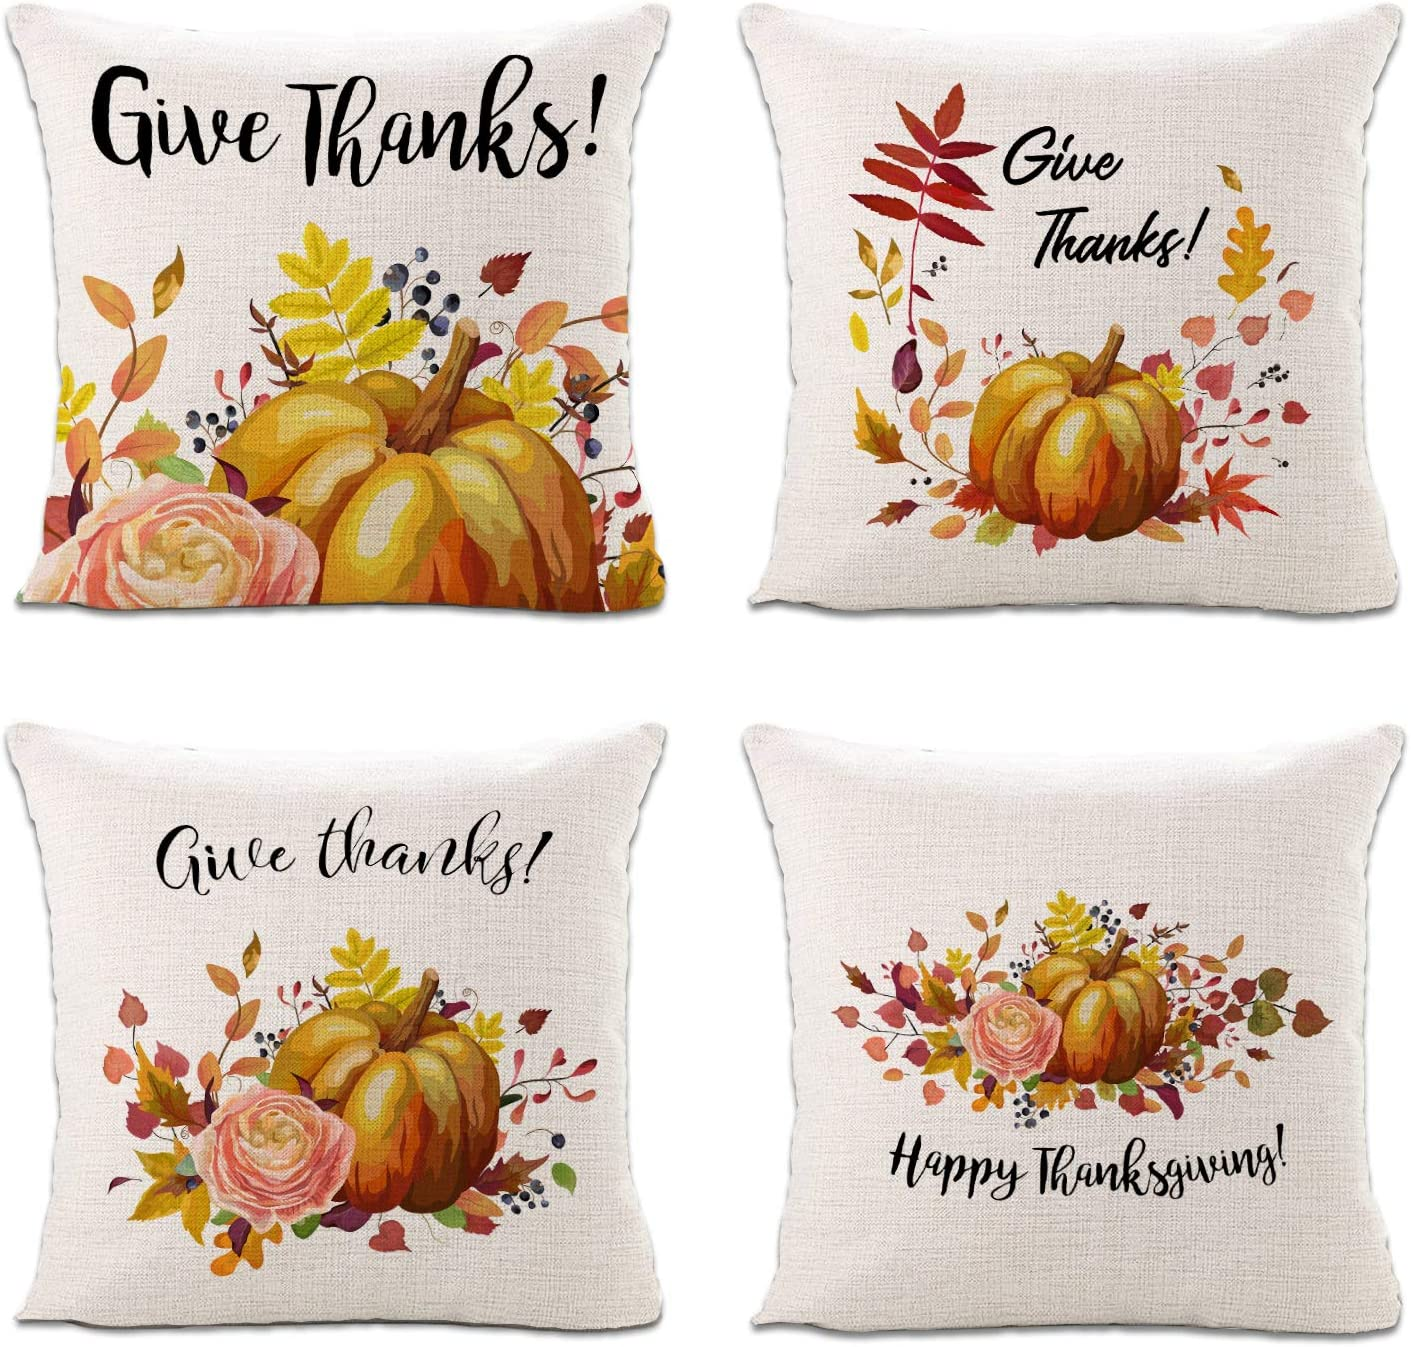 8 Lot Sinpooo Spring Decorative Throw Pillow Covers